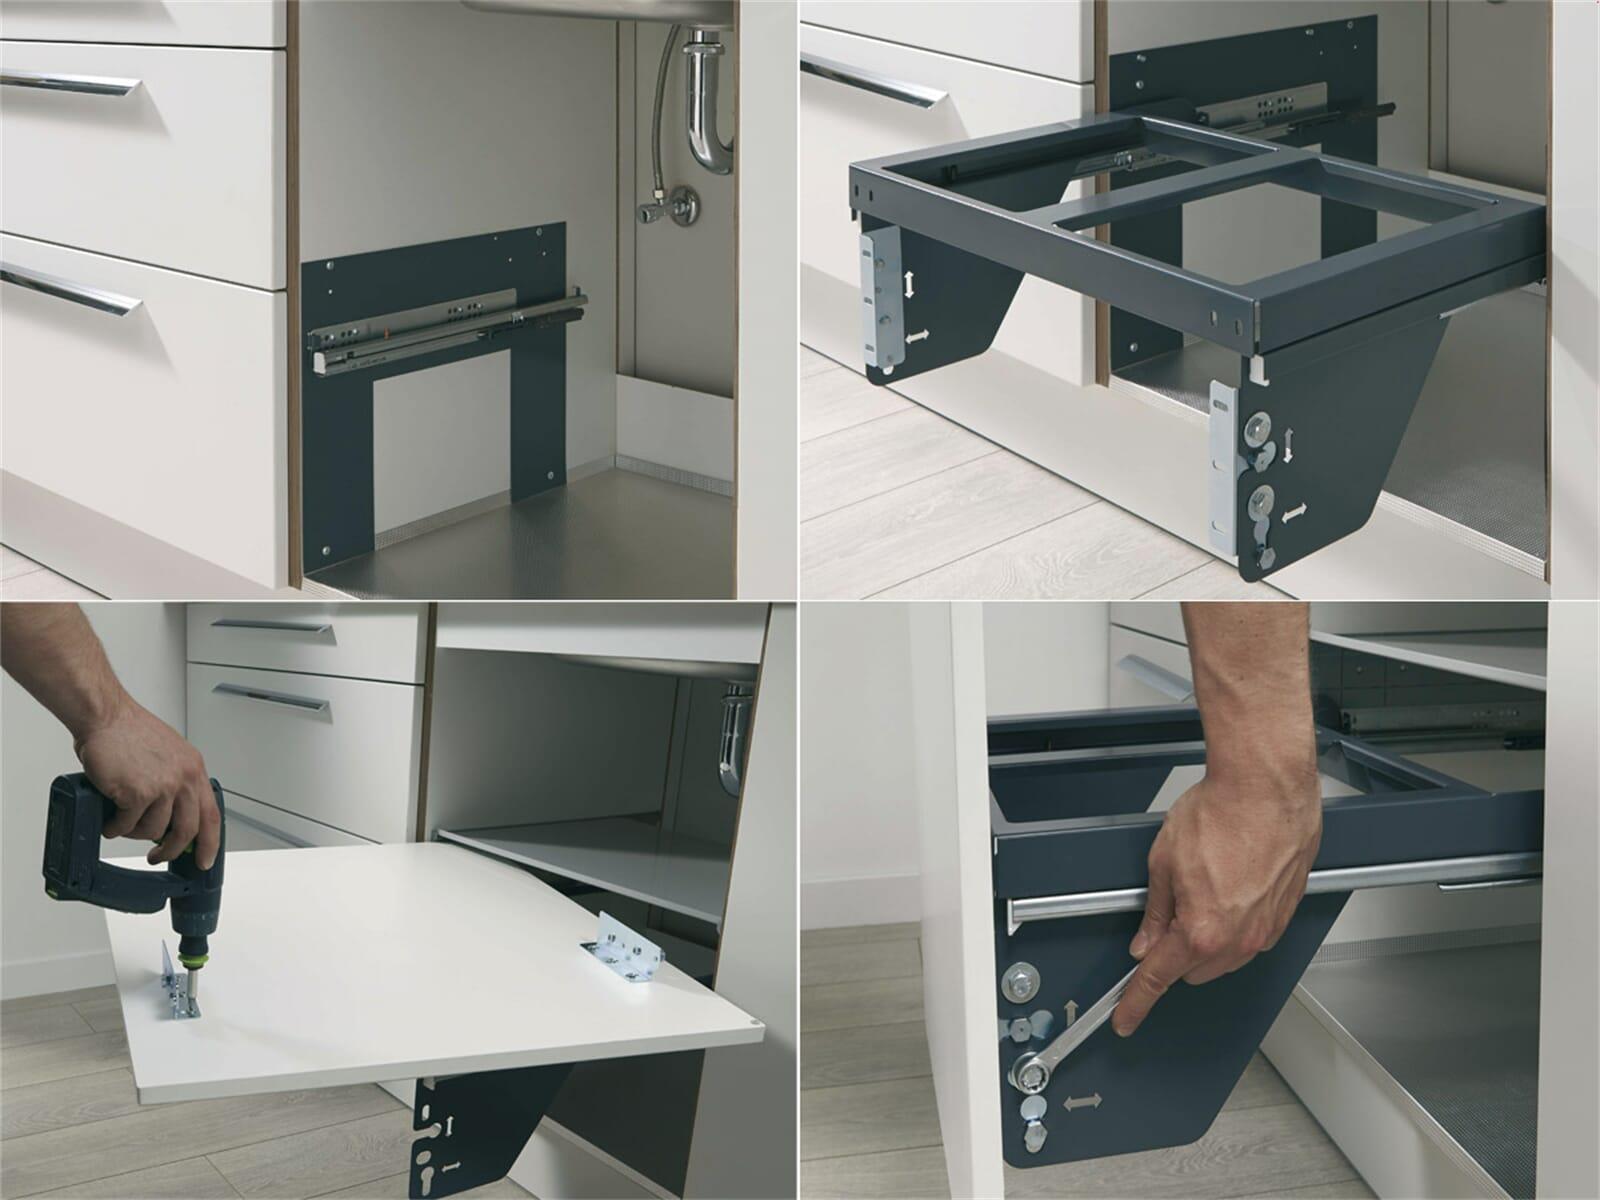 wesco sortomaxx 840503 60 einbau abfallsammler. Black Bedroom Furniture Sets. Home Design Ideas